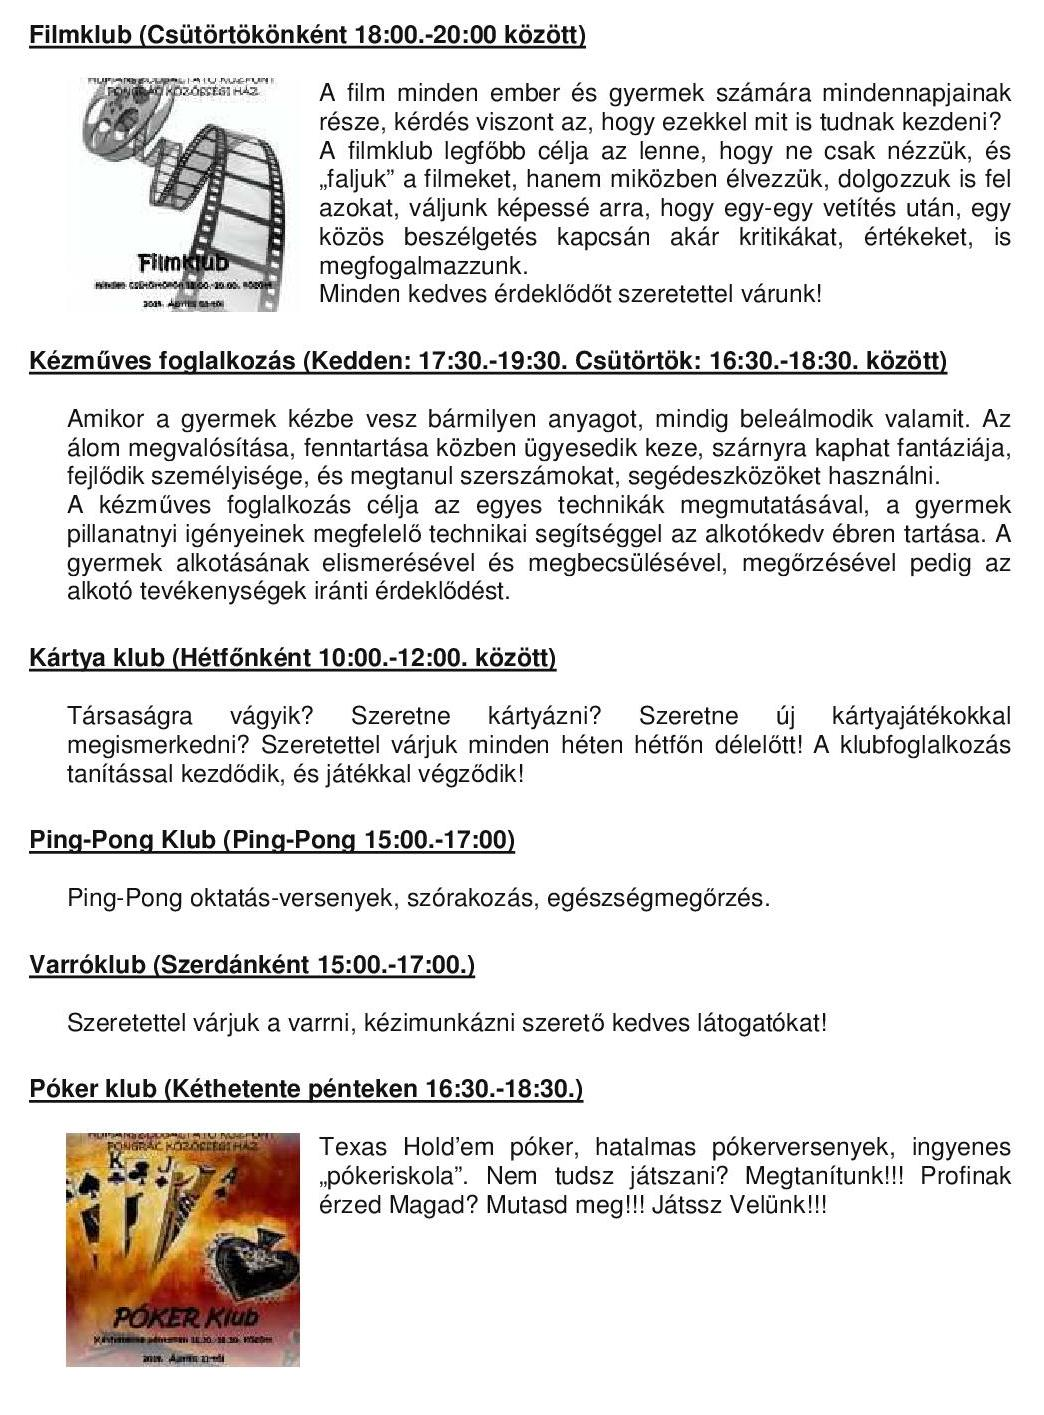 2014.04.02_PKH_allando_programkinalat_02